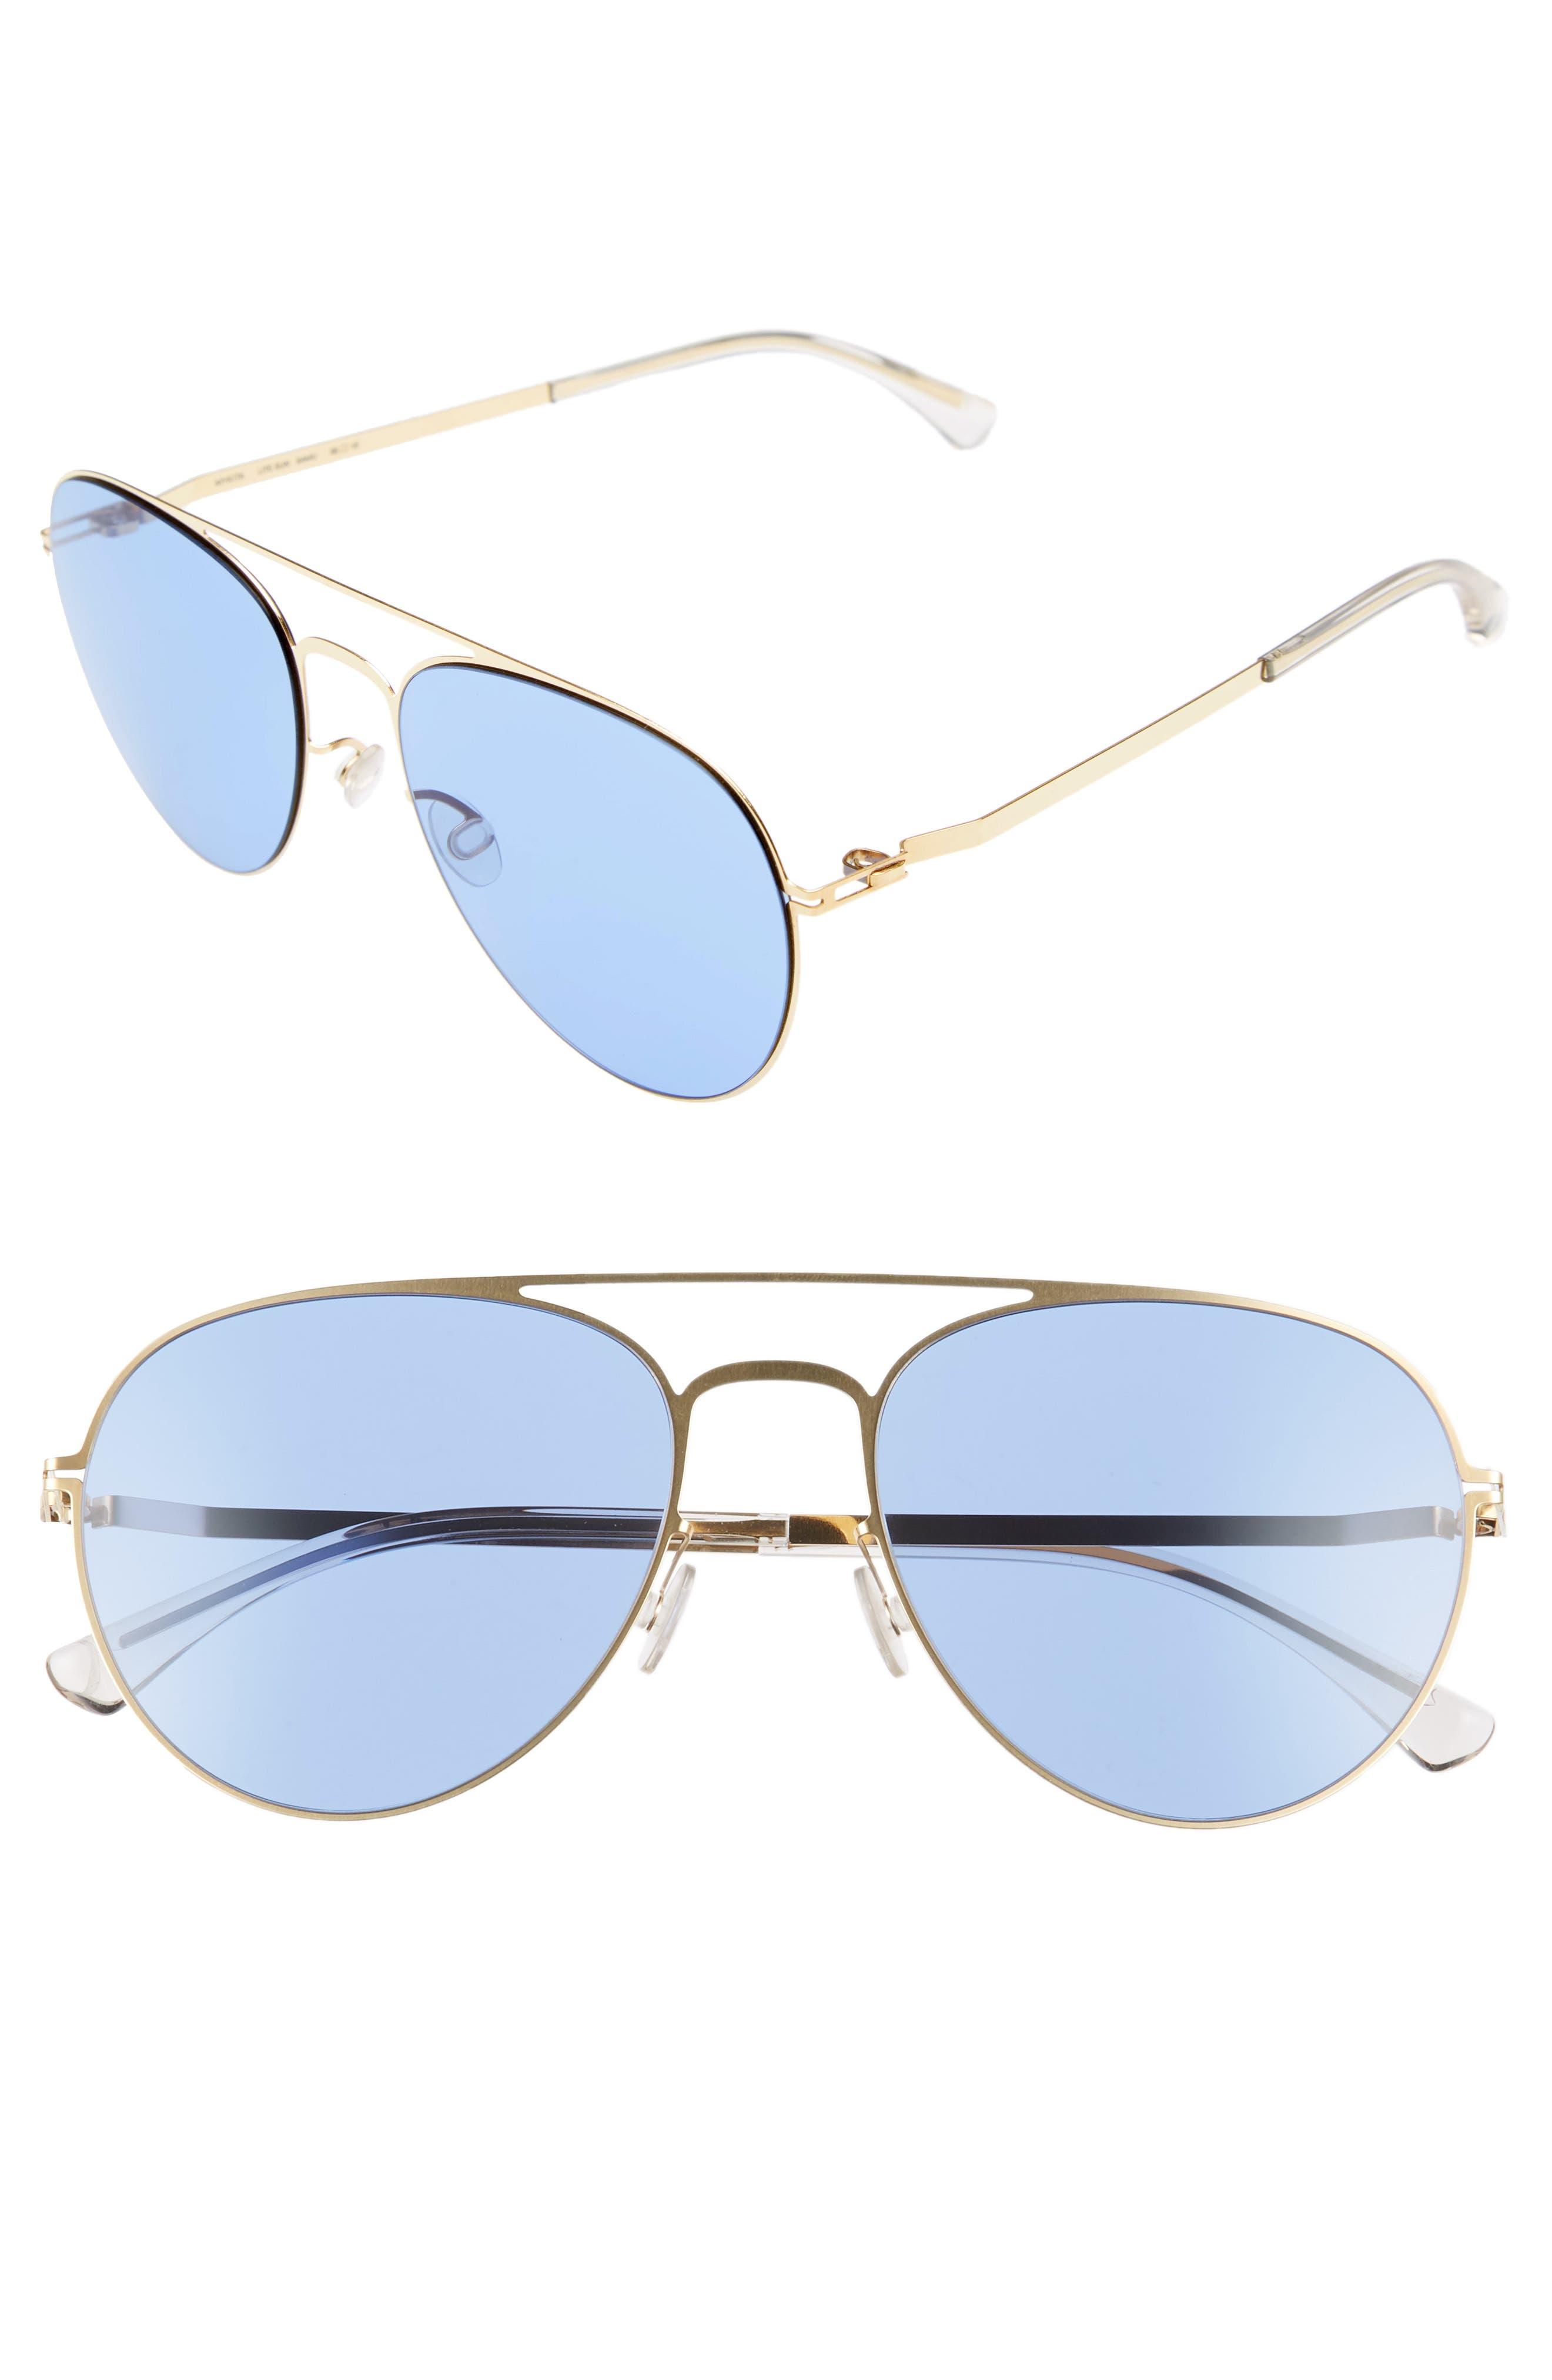 Samu 55mm Aviator Sunglasses,                             Main thumbnail 1, color,                             Glossy Gold